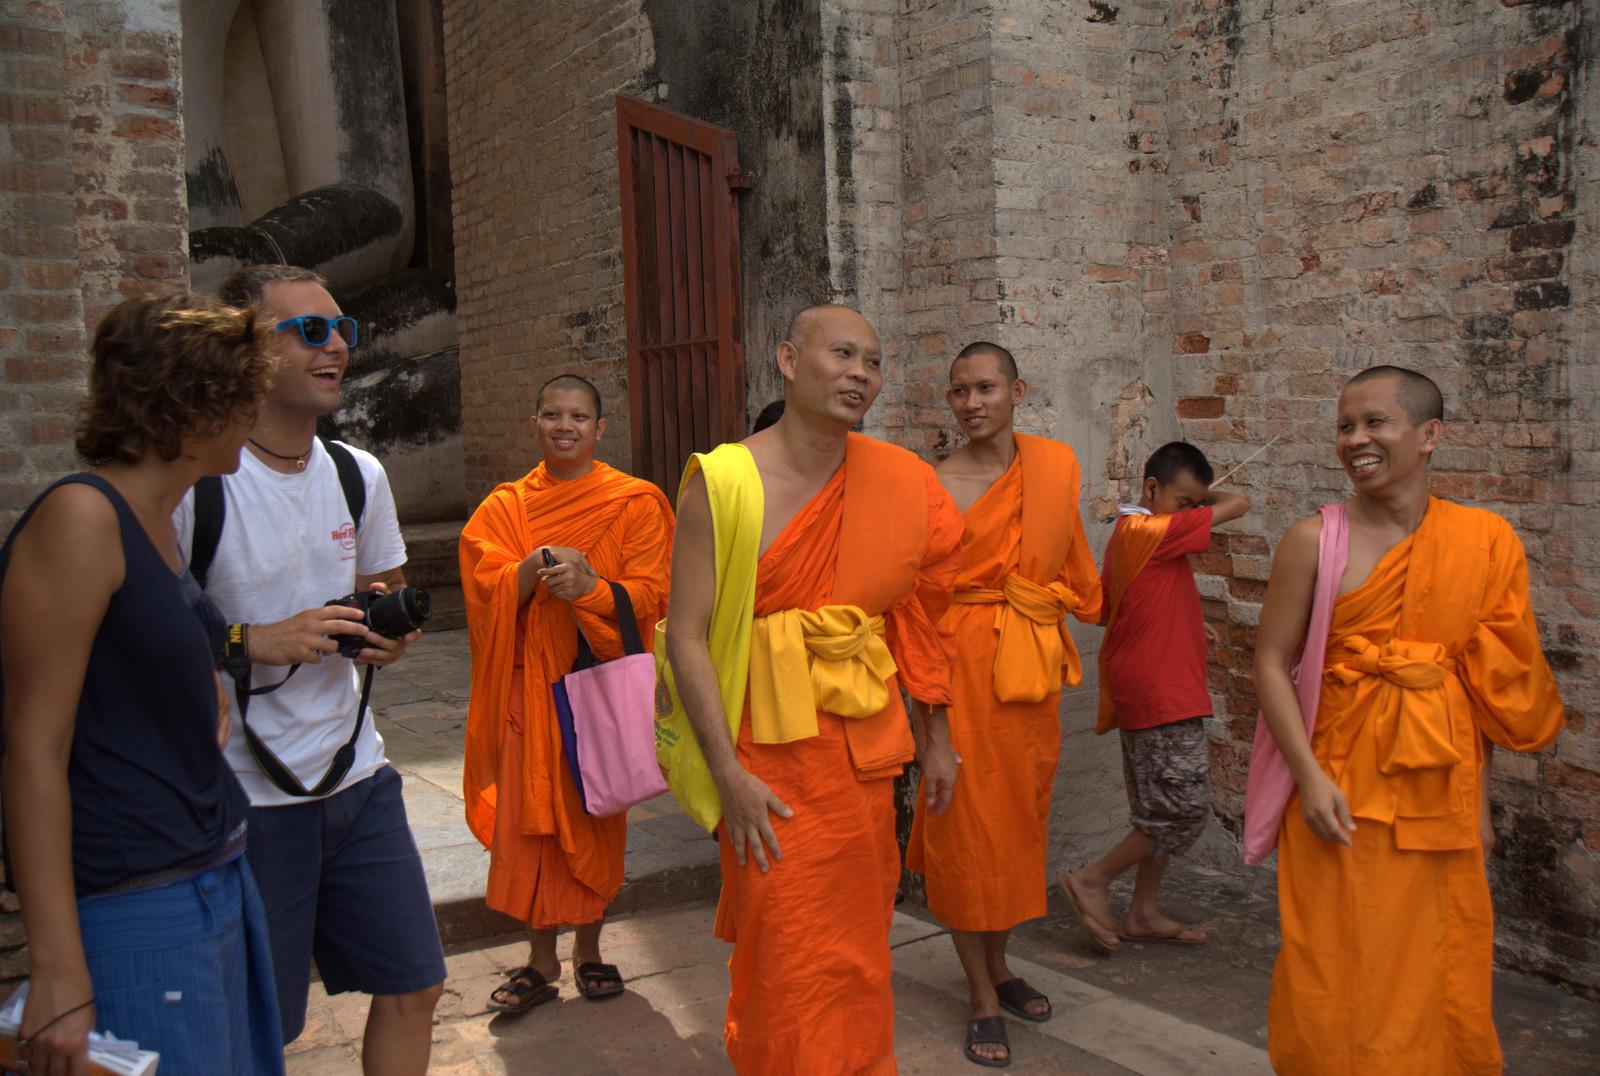 Miasta kultu, miasta małp, ale najbardziej Lampang 154